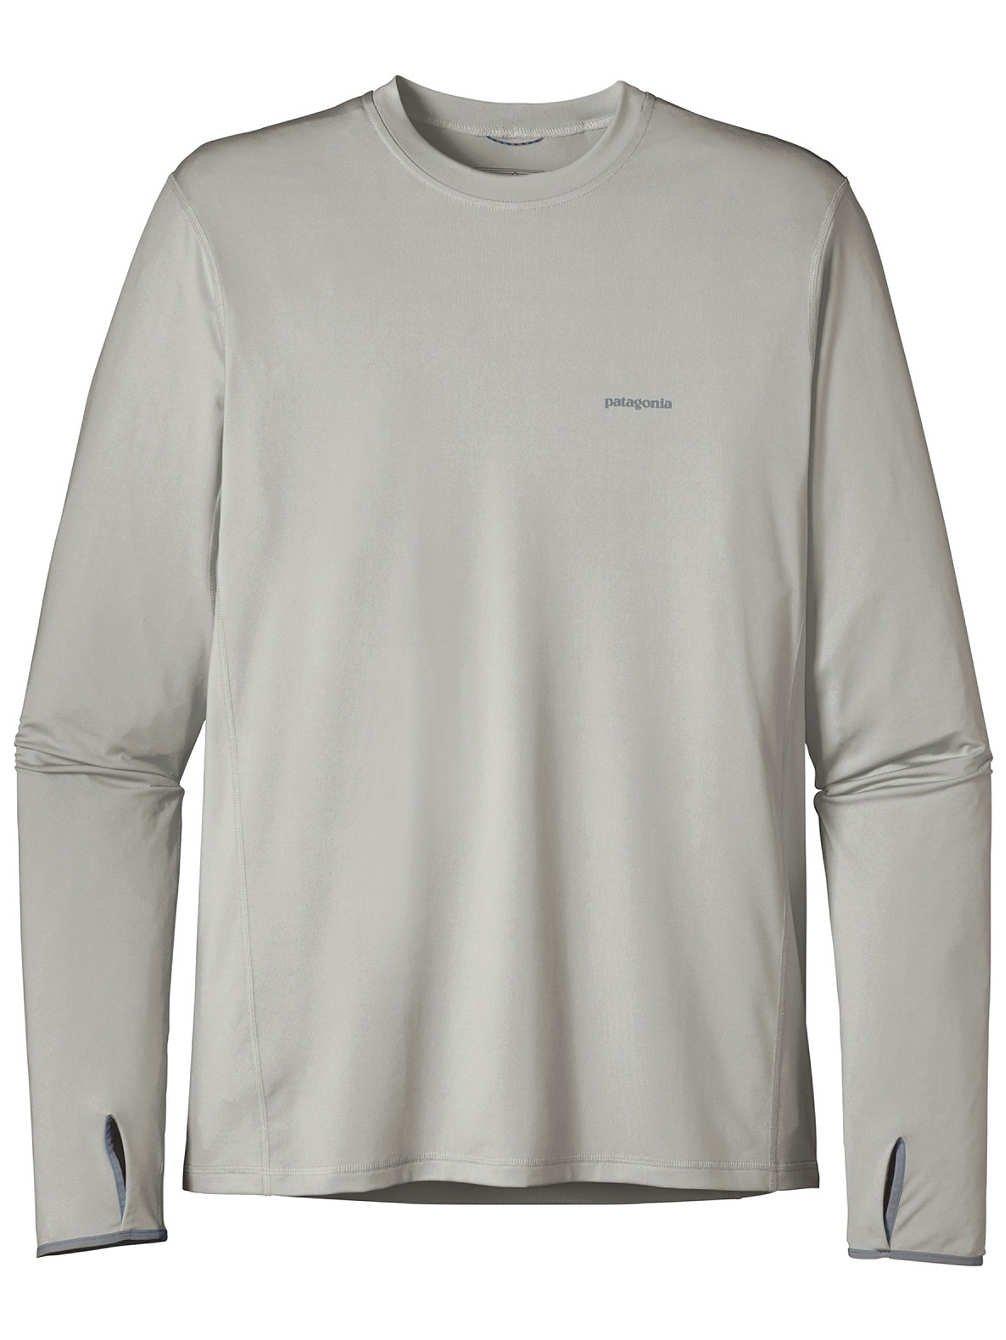 Patagonia M & 039;S Tropic Comfort Crew II Shirt, Herren